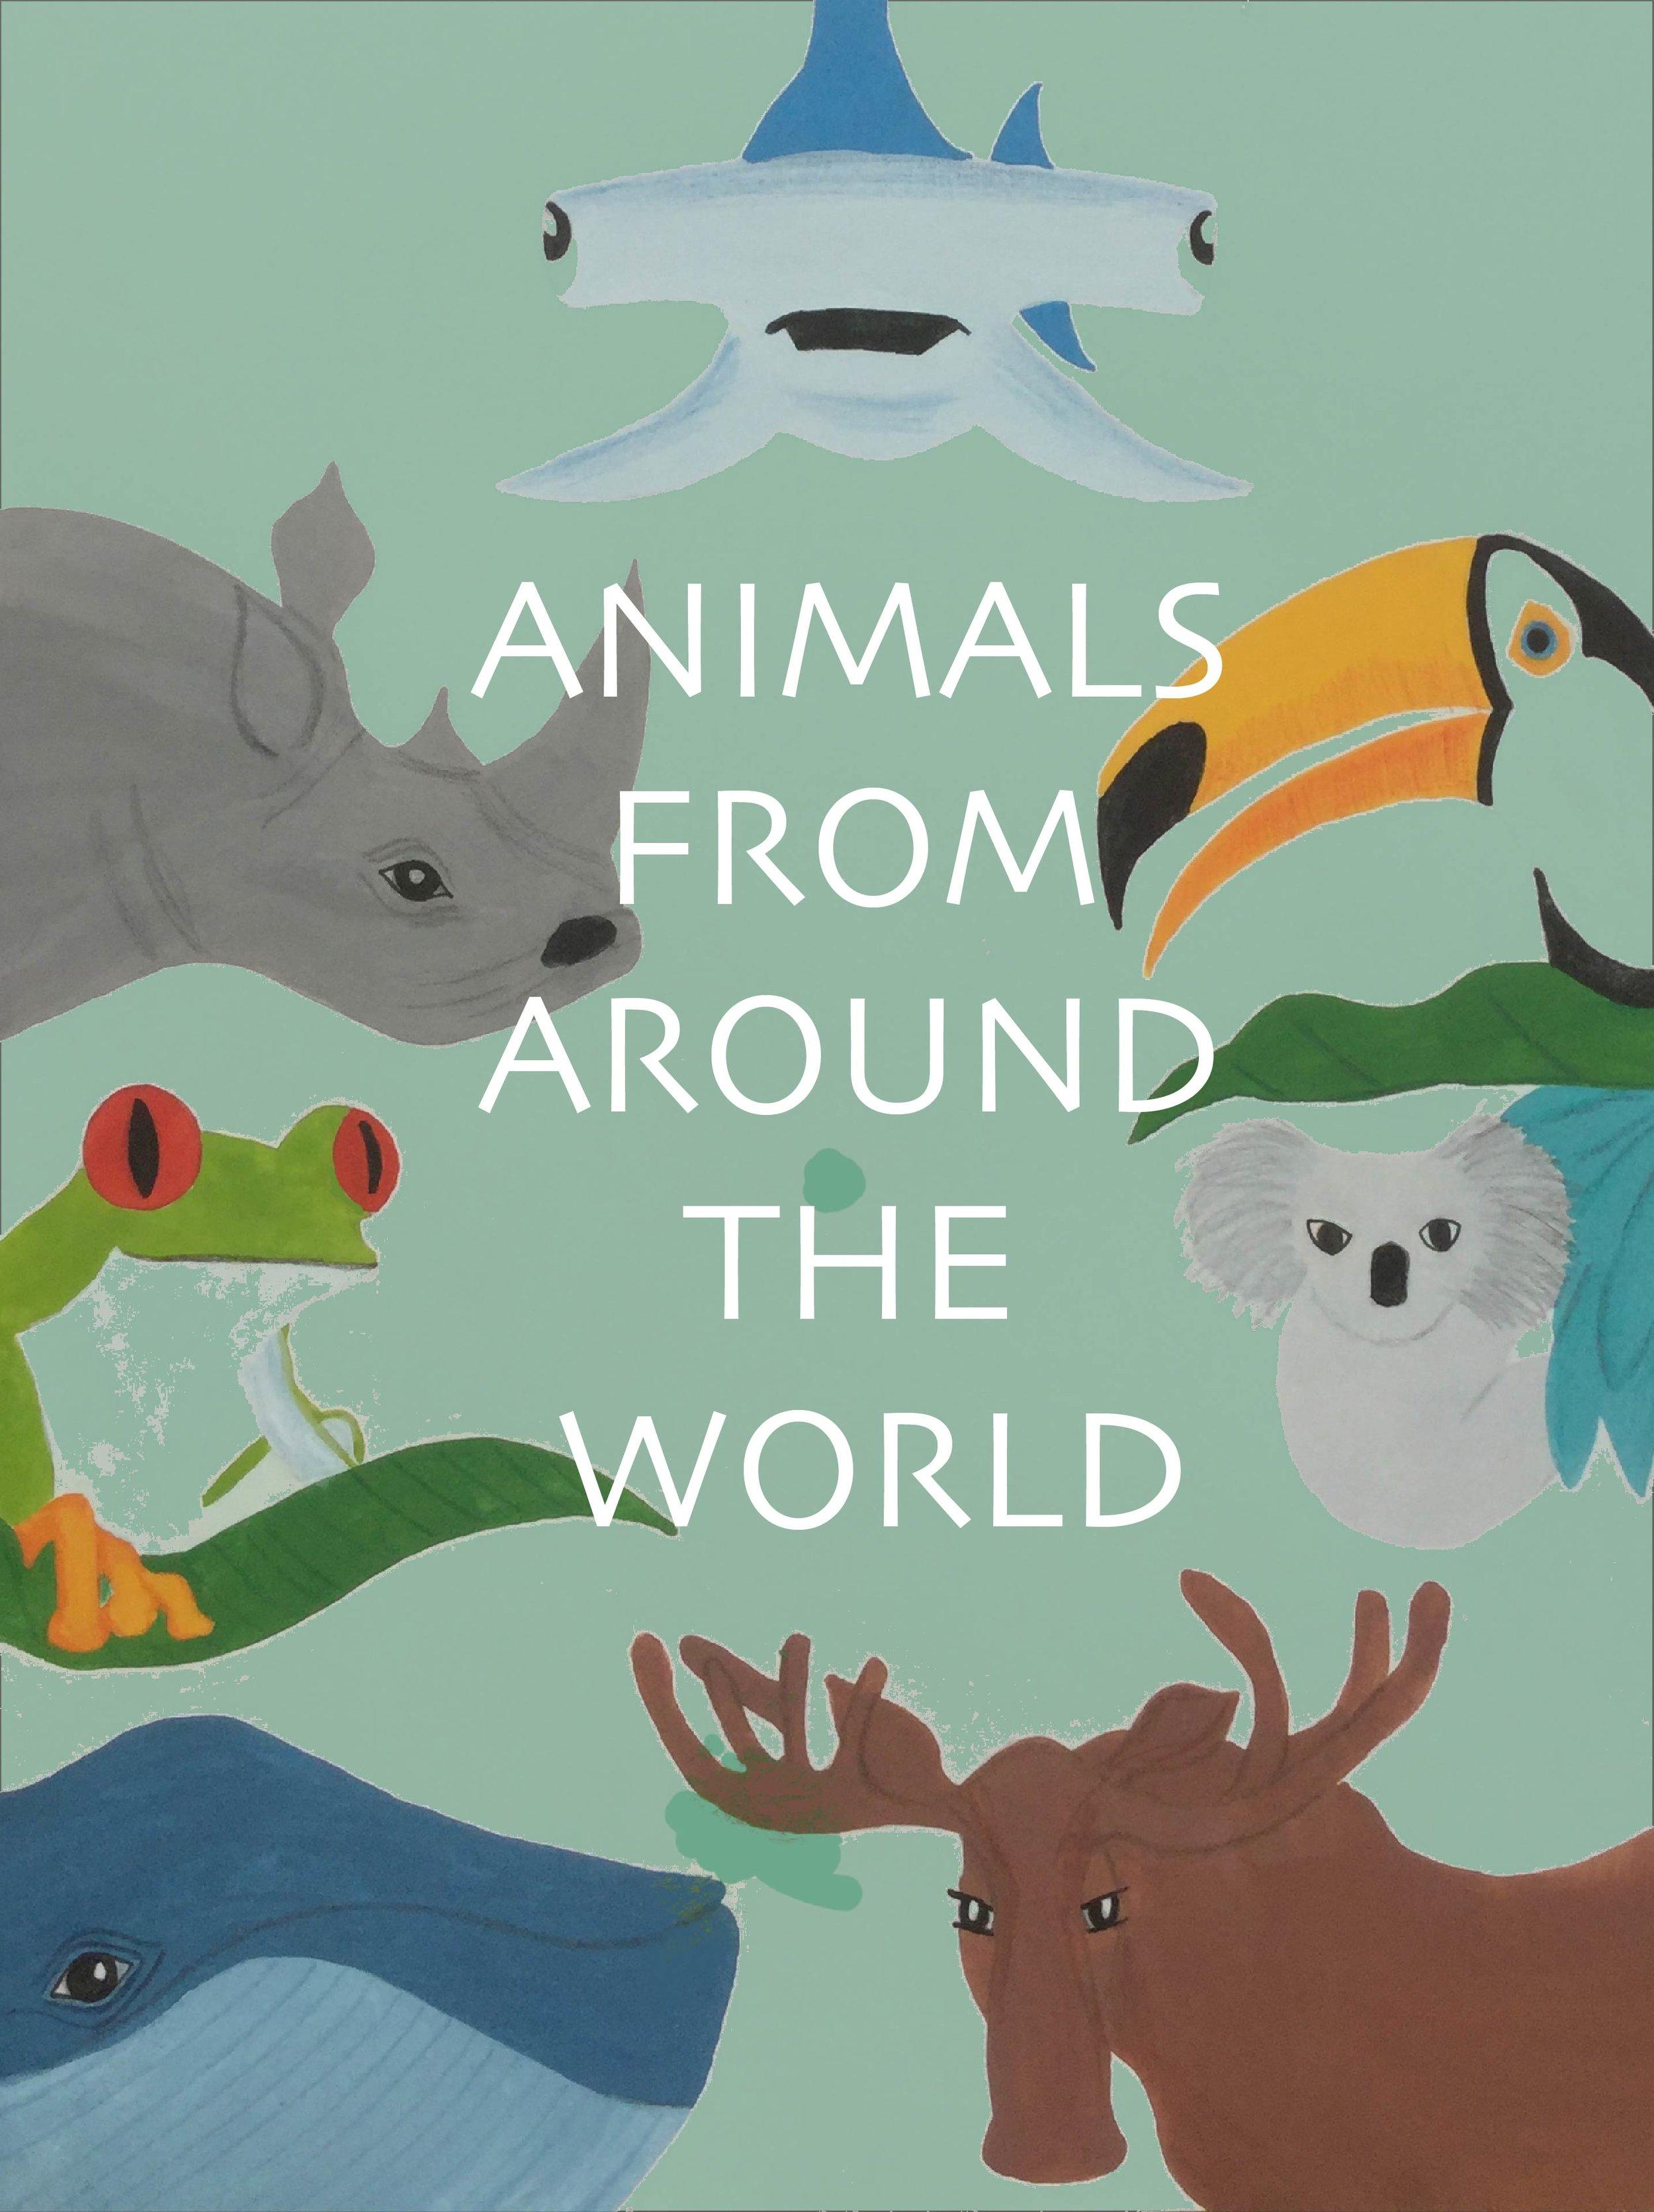 ANIMAL COVER 3B-01.jpg